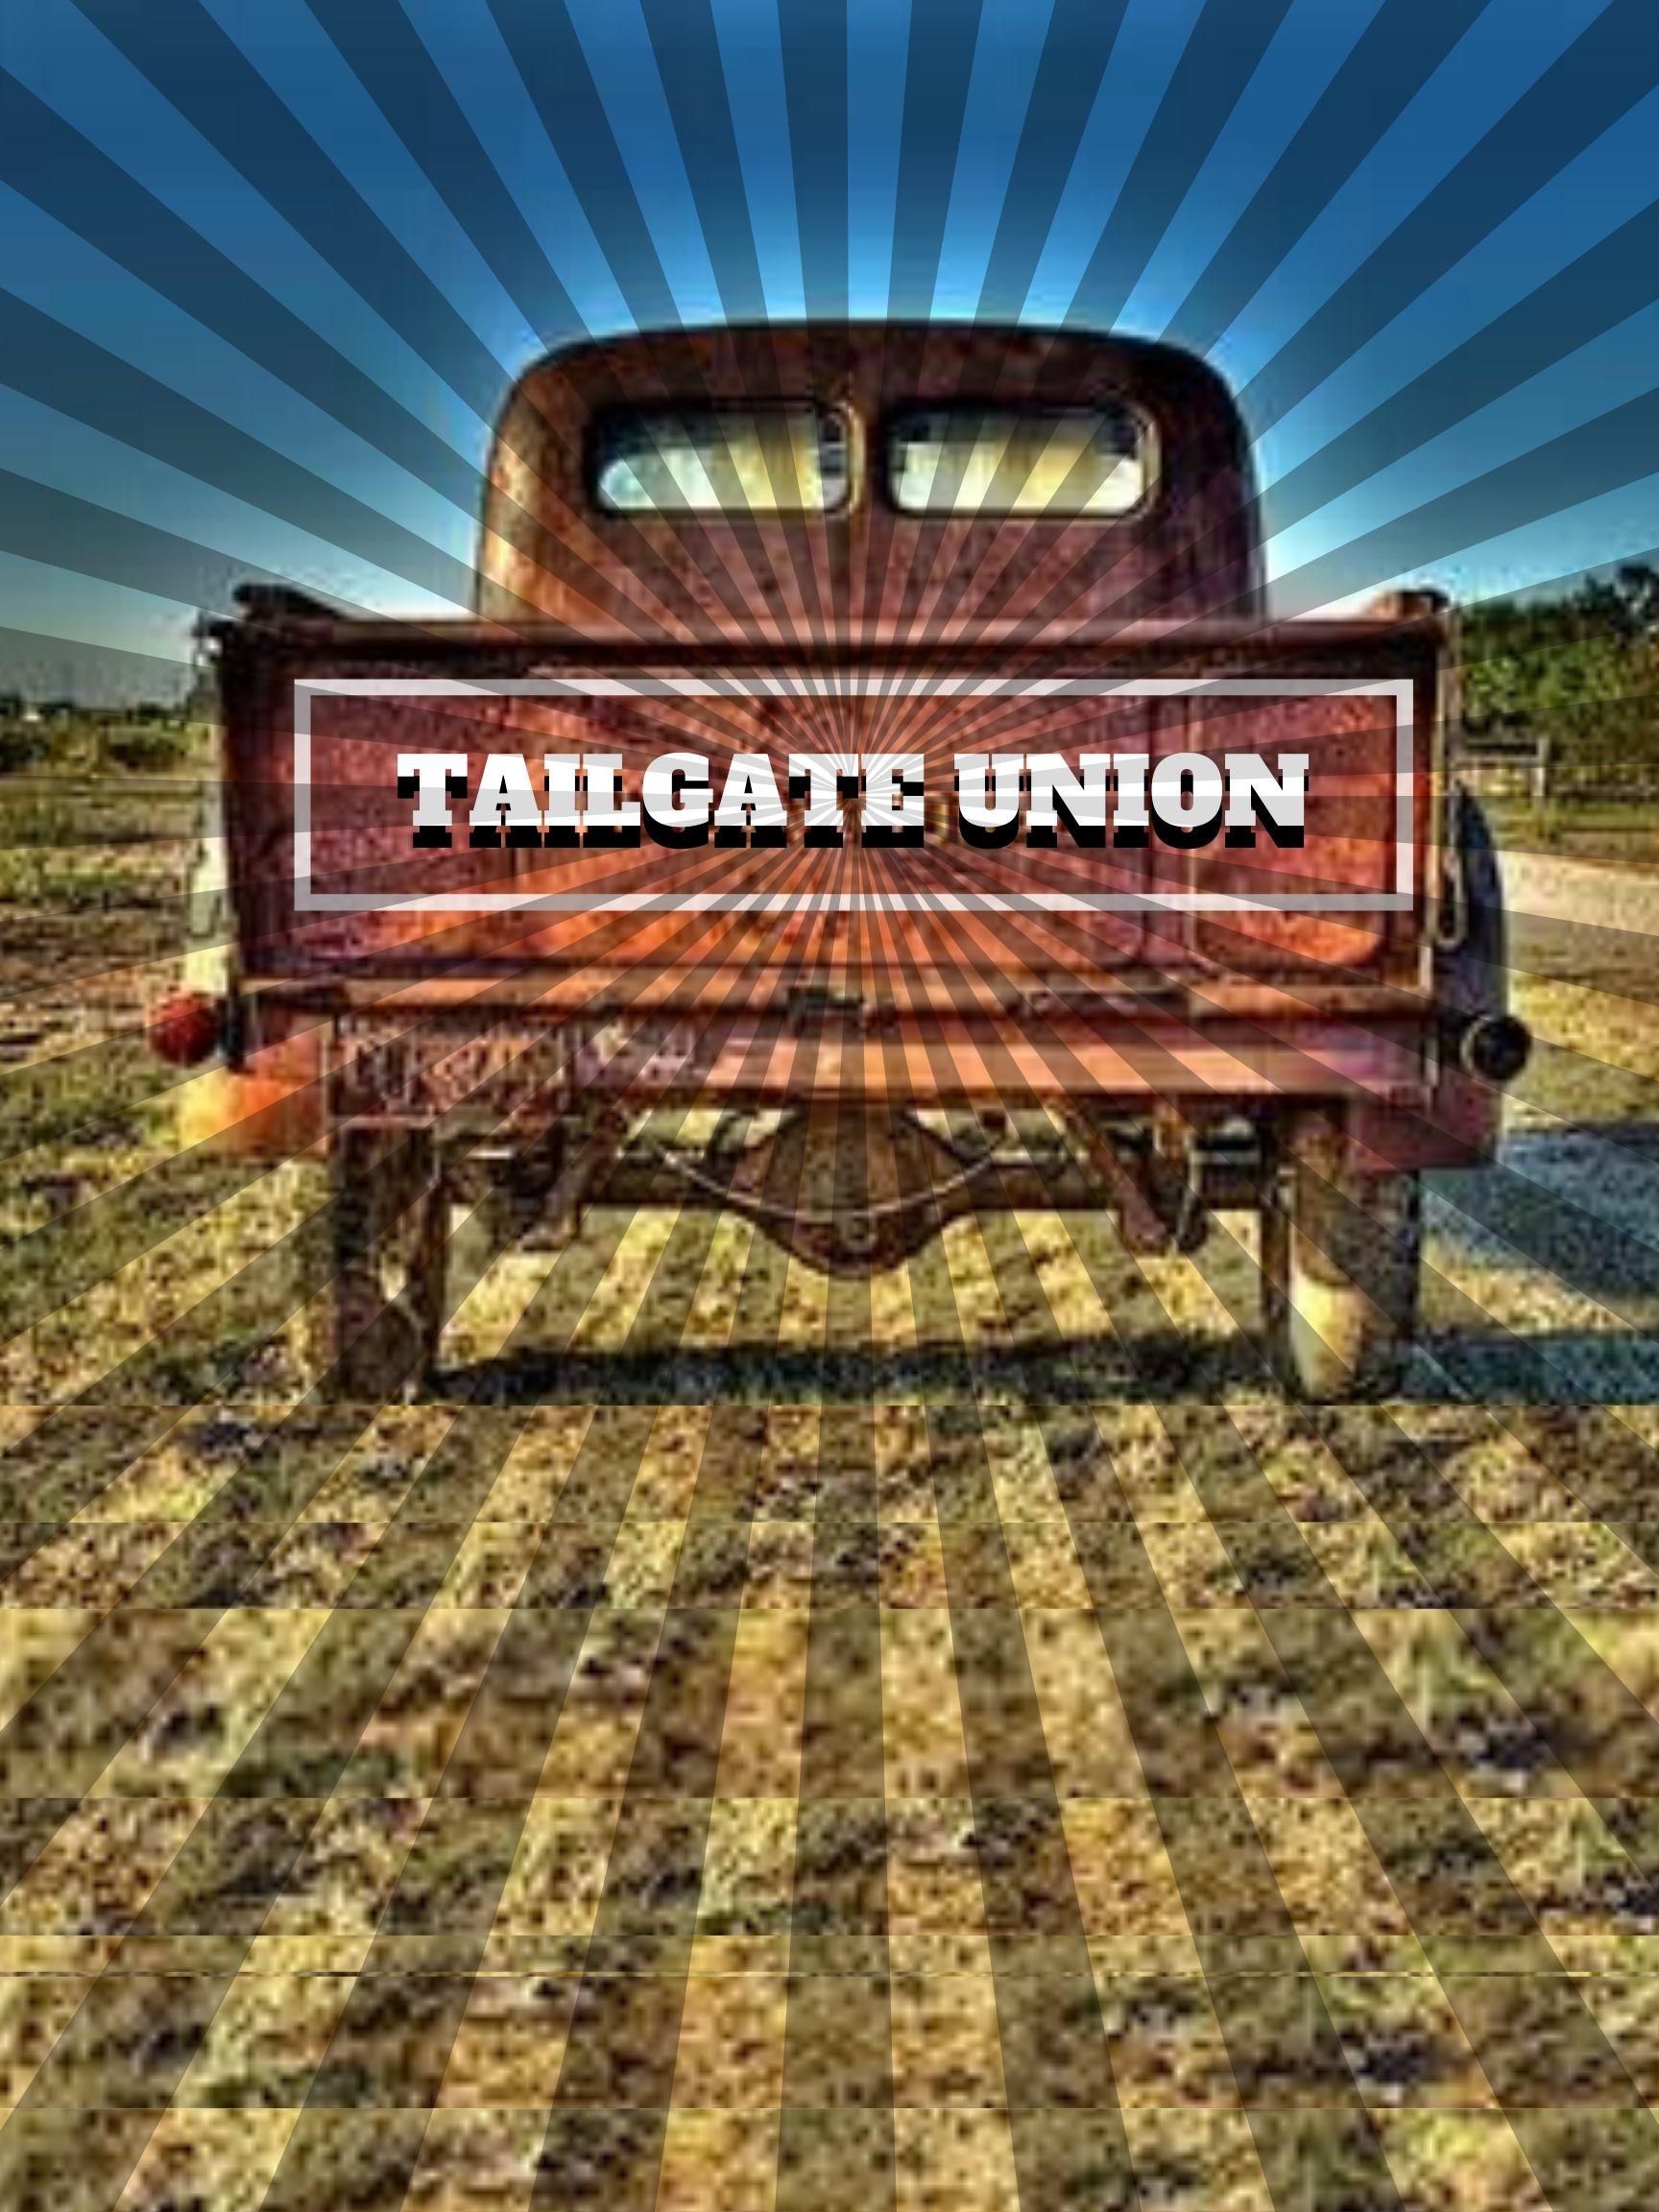 TAILGATE UNION